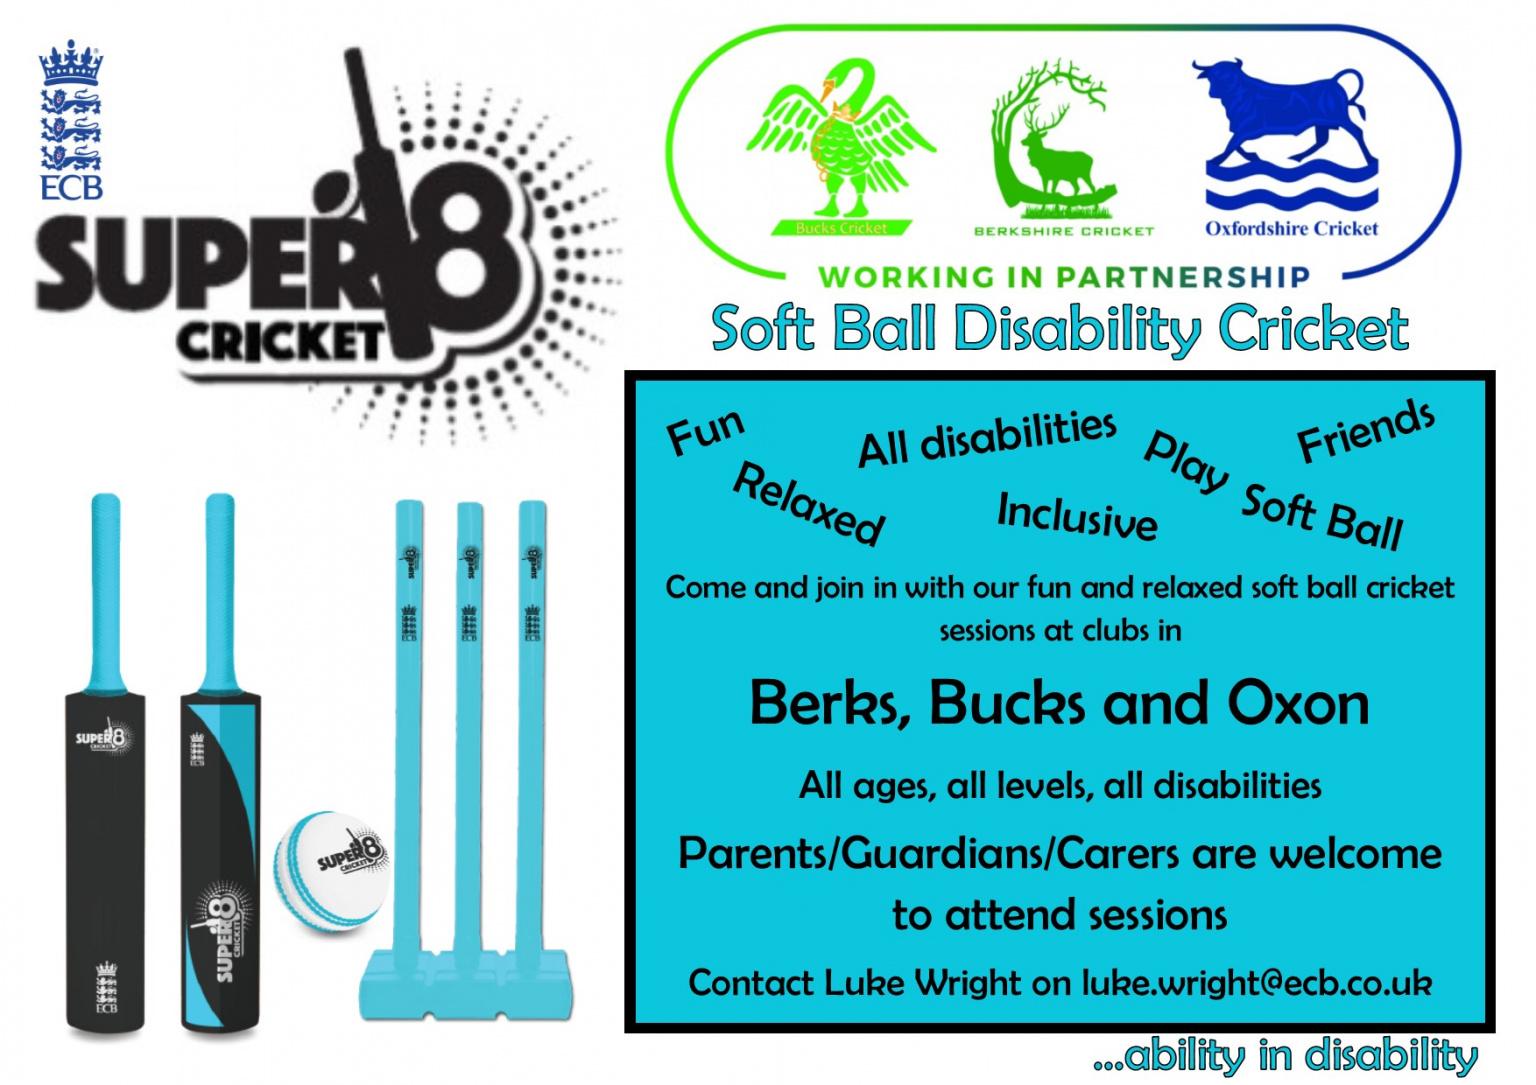 Disability Cricket - Super 8 Cricket - Super 8 Cricket